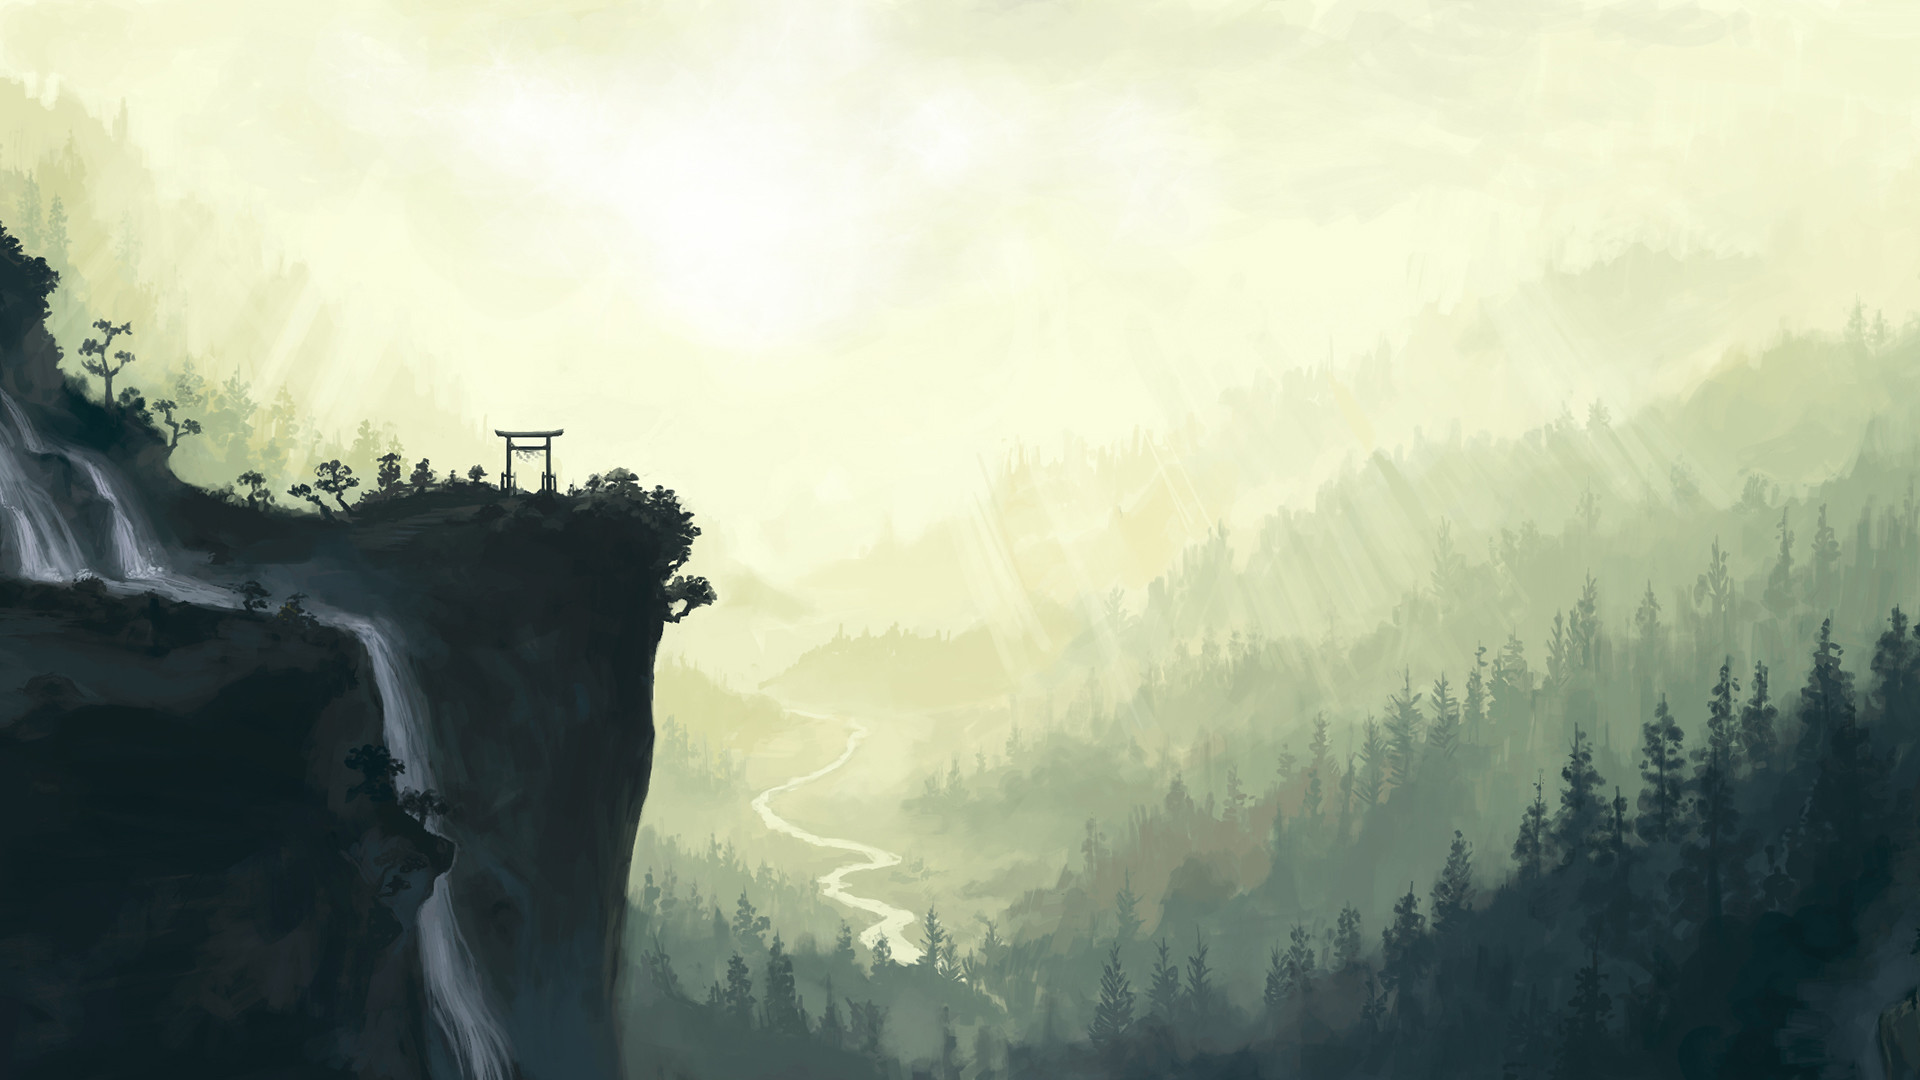 Anime Scenery Wallpaper Tumblr High Resolution …